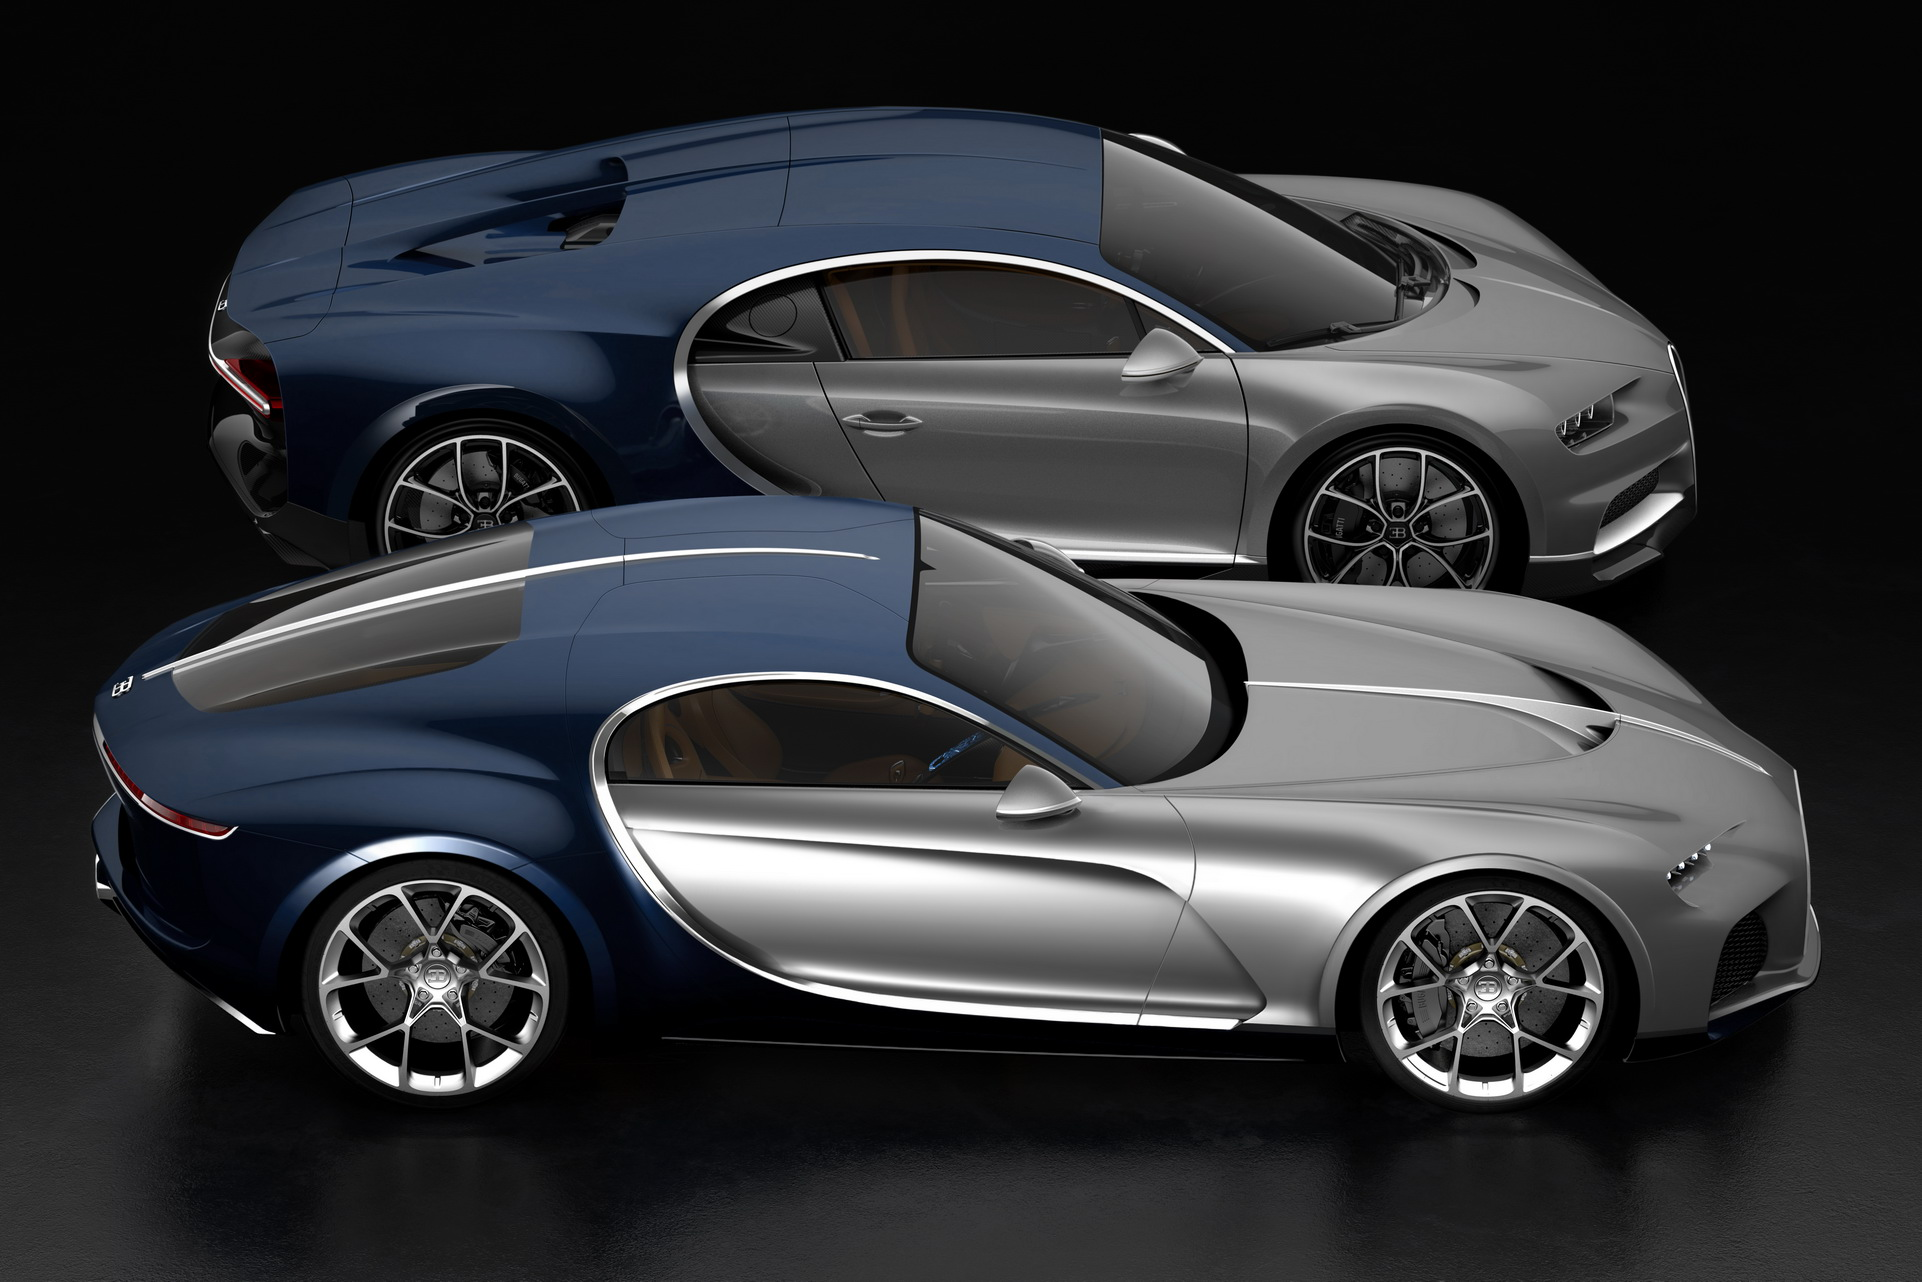 Bugatti S Never Before Seen Secret Concept Hypercars Revealed Carscoops